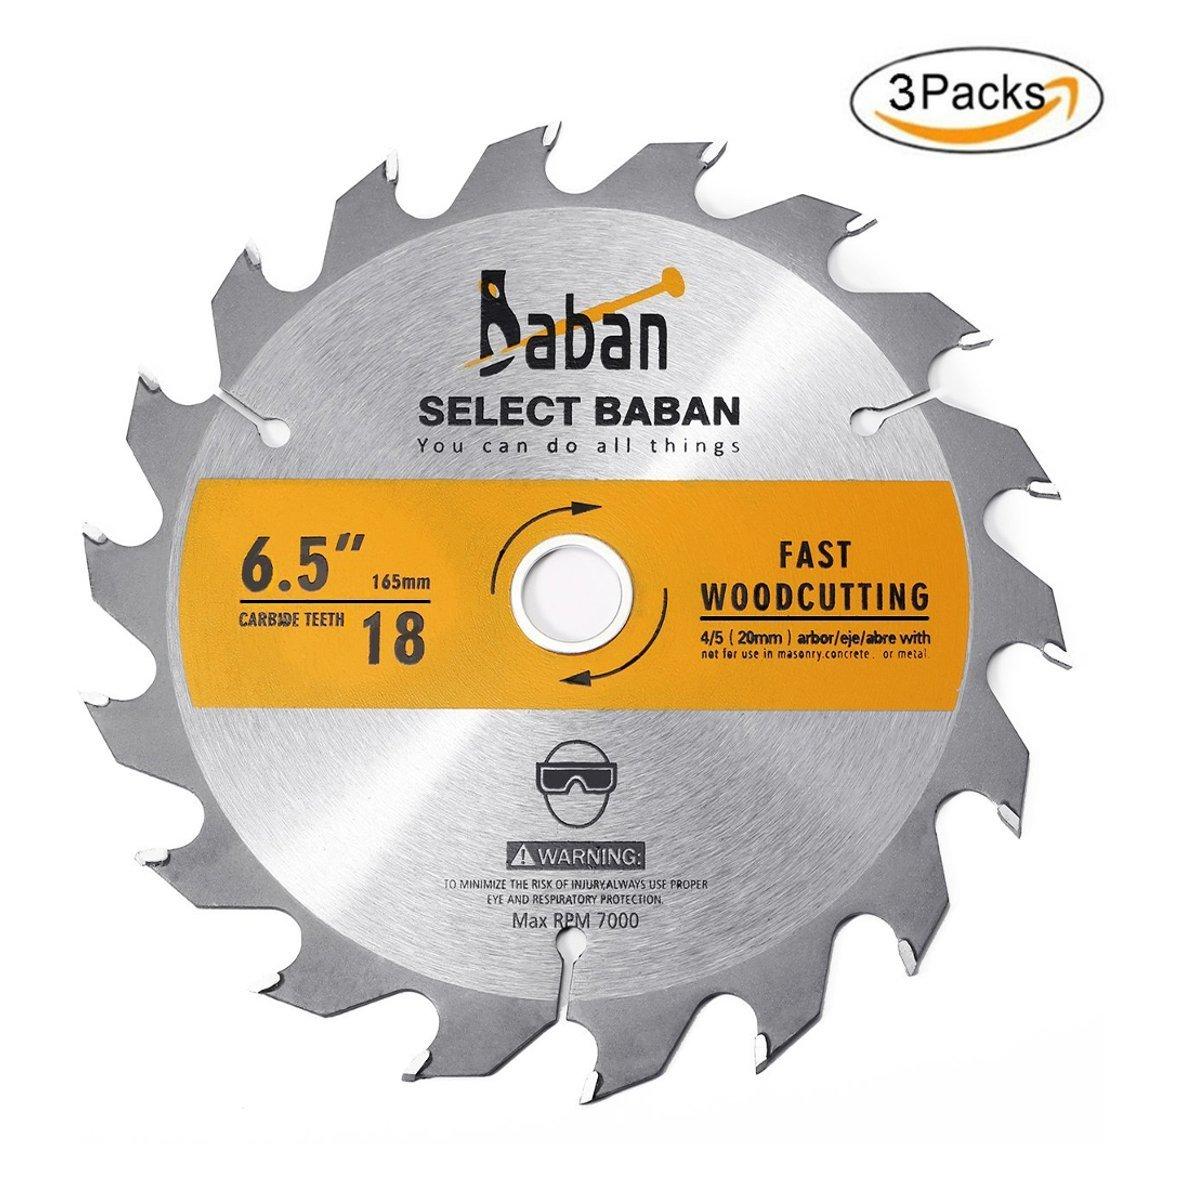 Cufflinks Baban Cufflinks for Men BabanMoworve1390